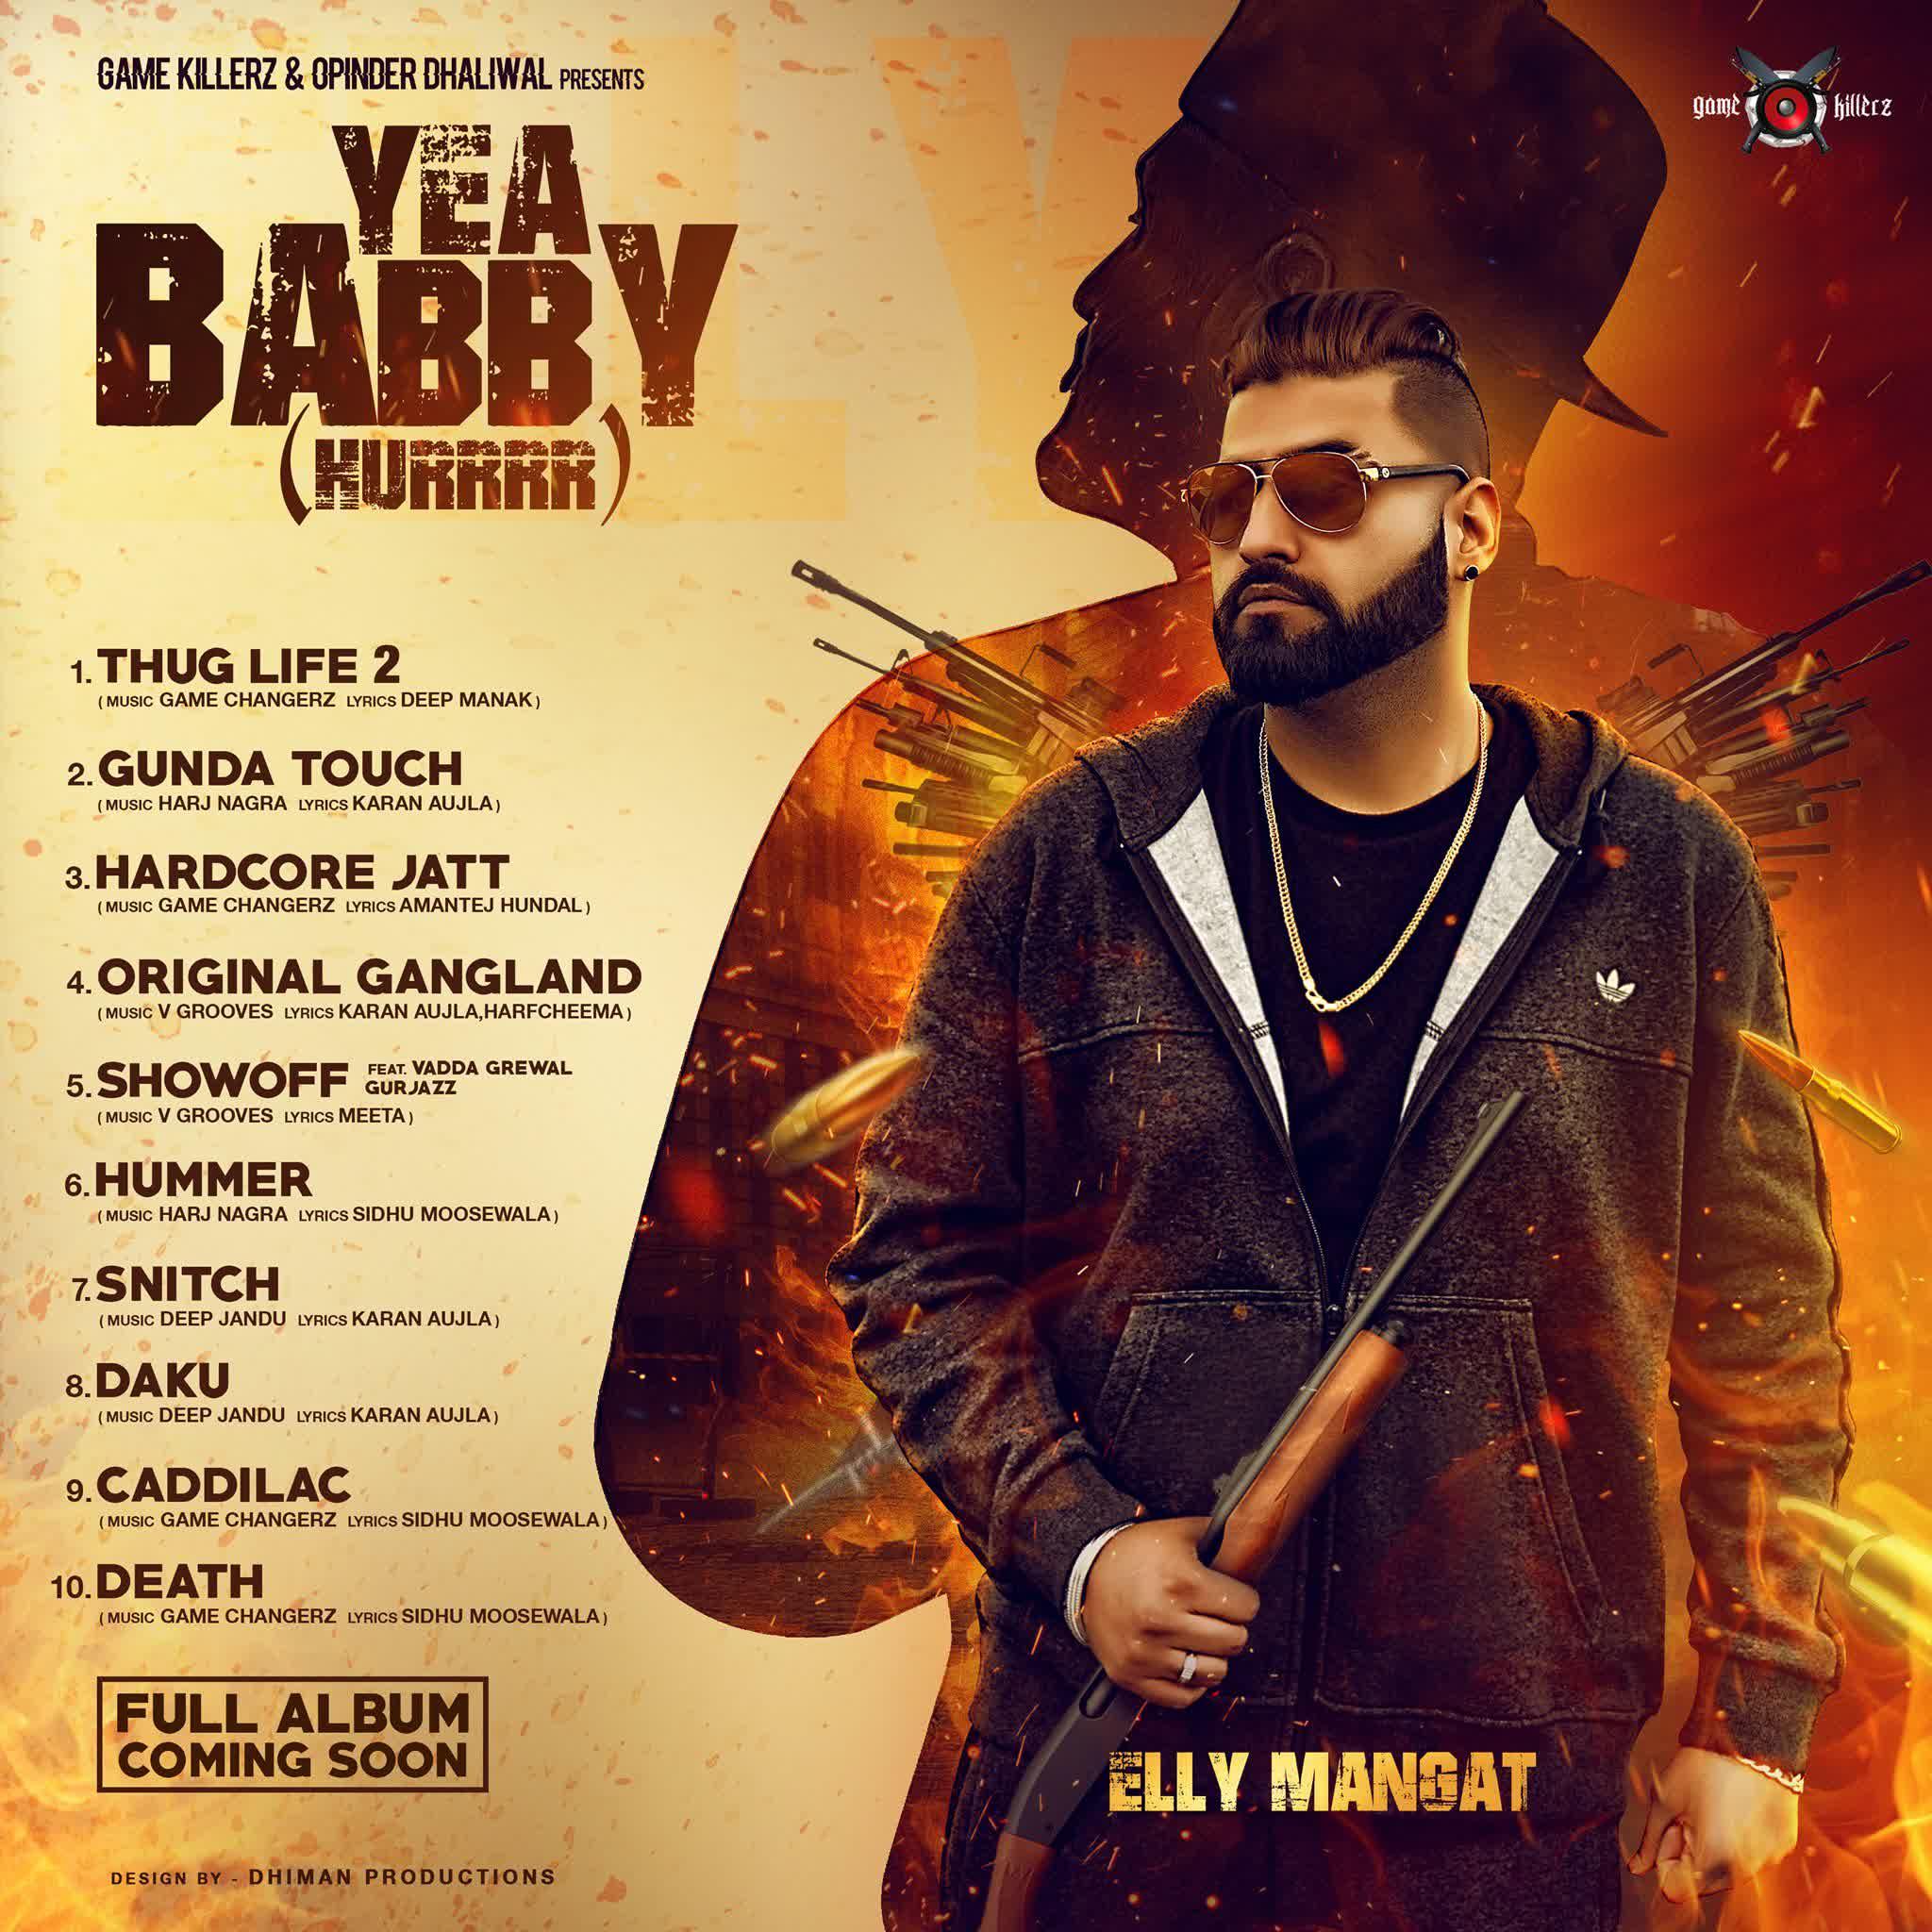 Yea Babby (Hurrrr) Elly Mangat